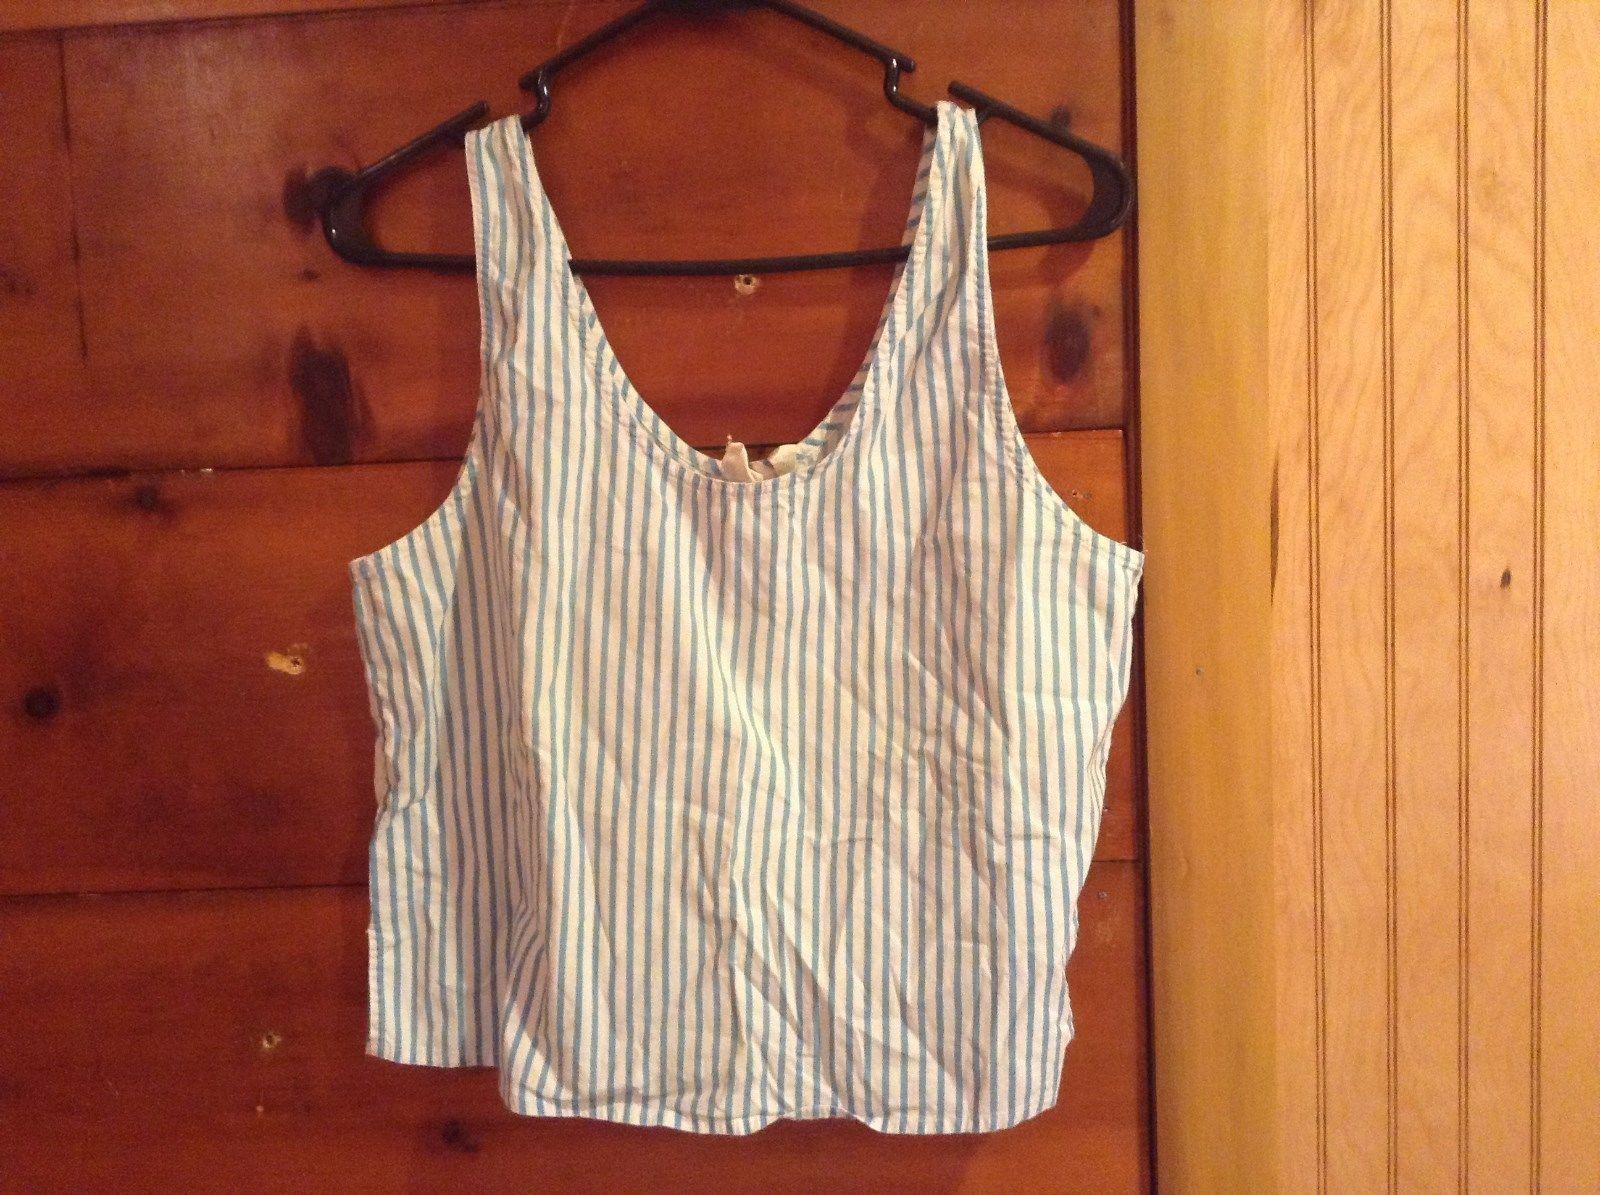 Victorias Secret Tank Top Sleepwear White and Blue Striped Size M Sleeveless